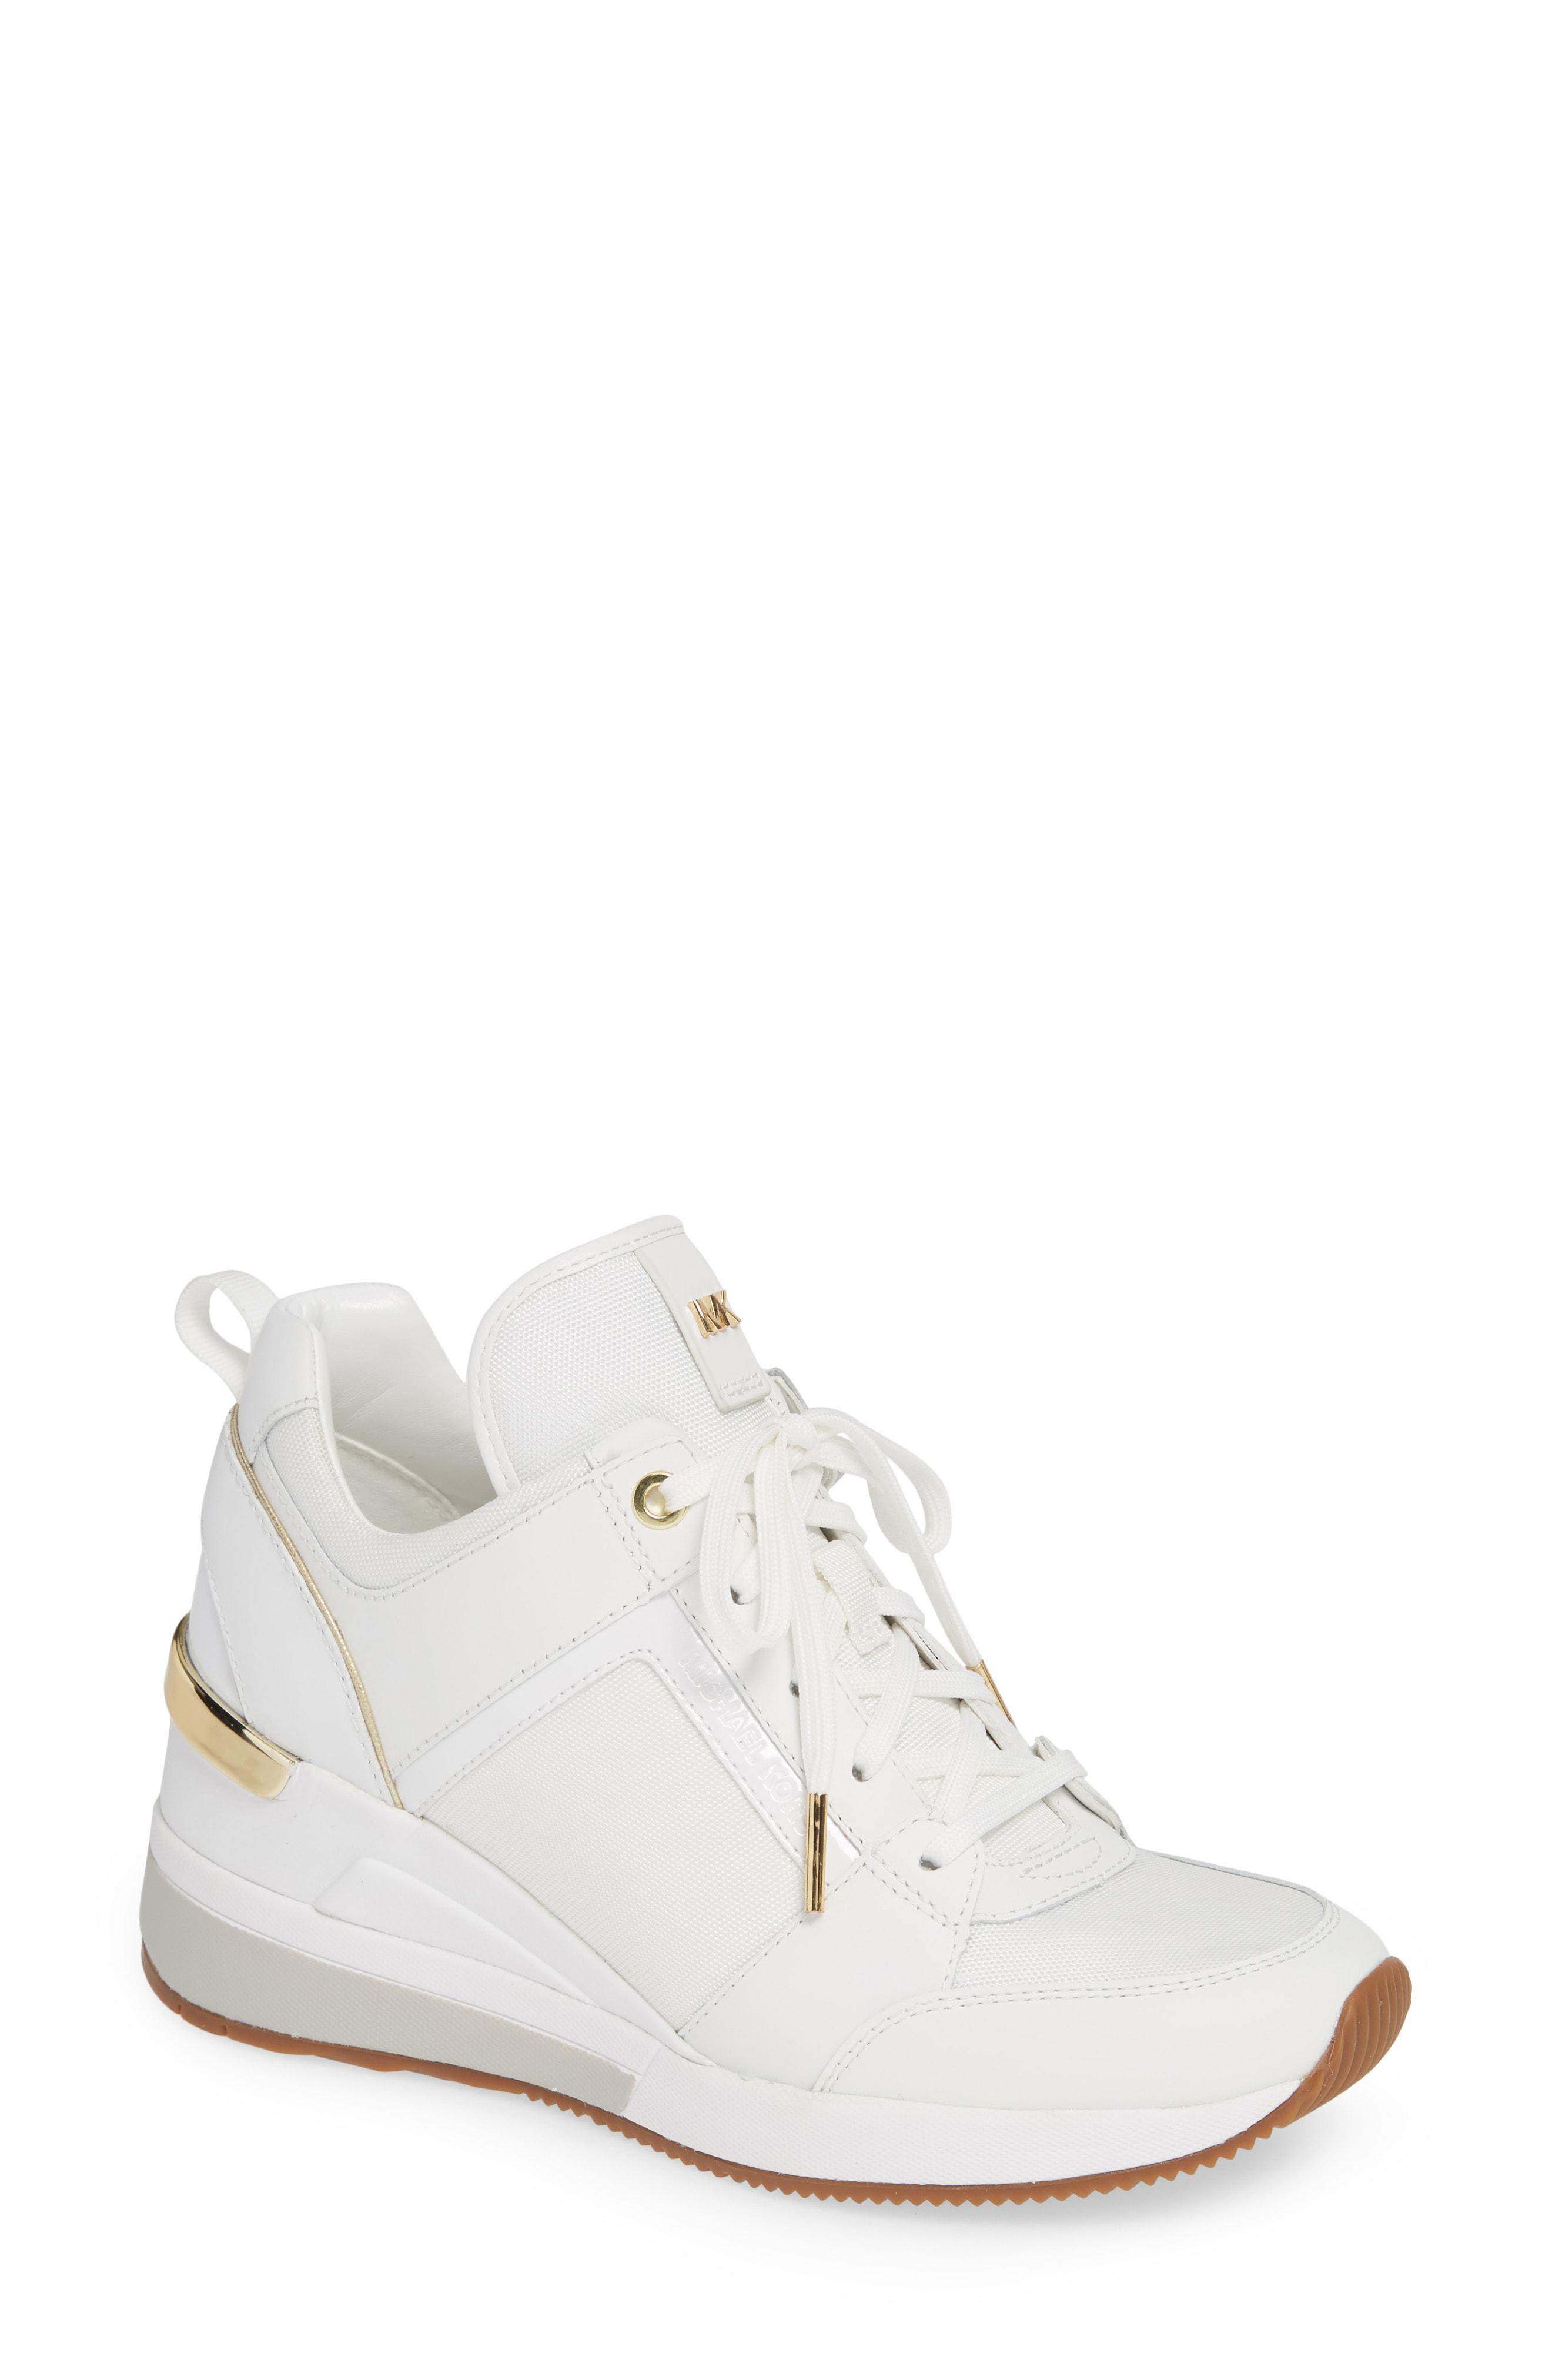 aa3d67ffe65 Michael Michael Kors Georgie Wedge Sneaker In Optic White Fabric ...